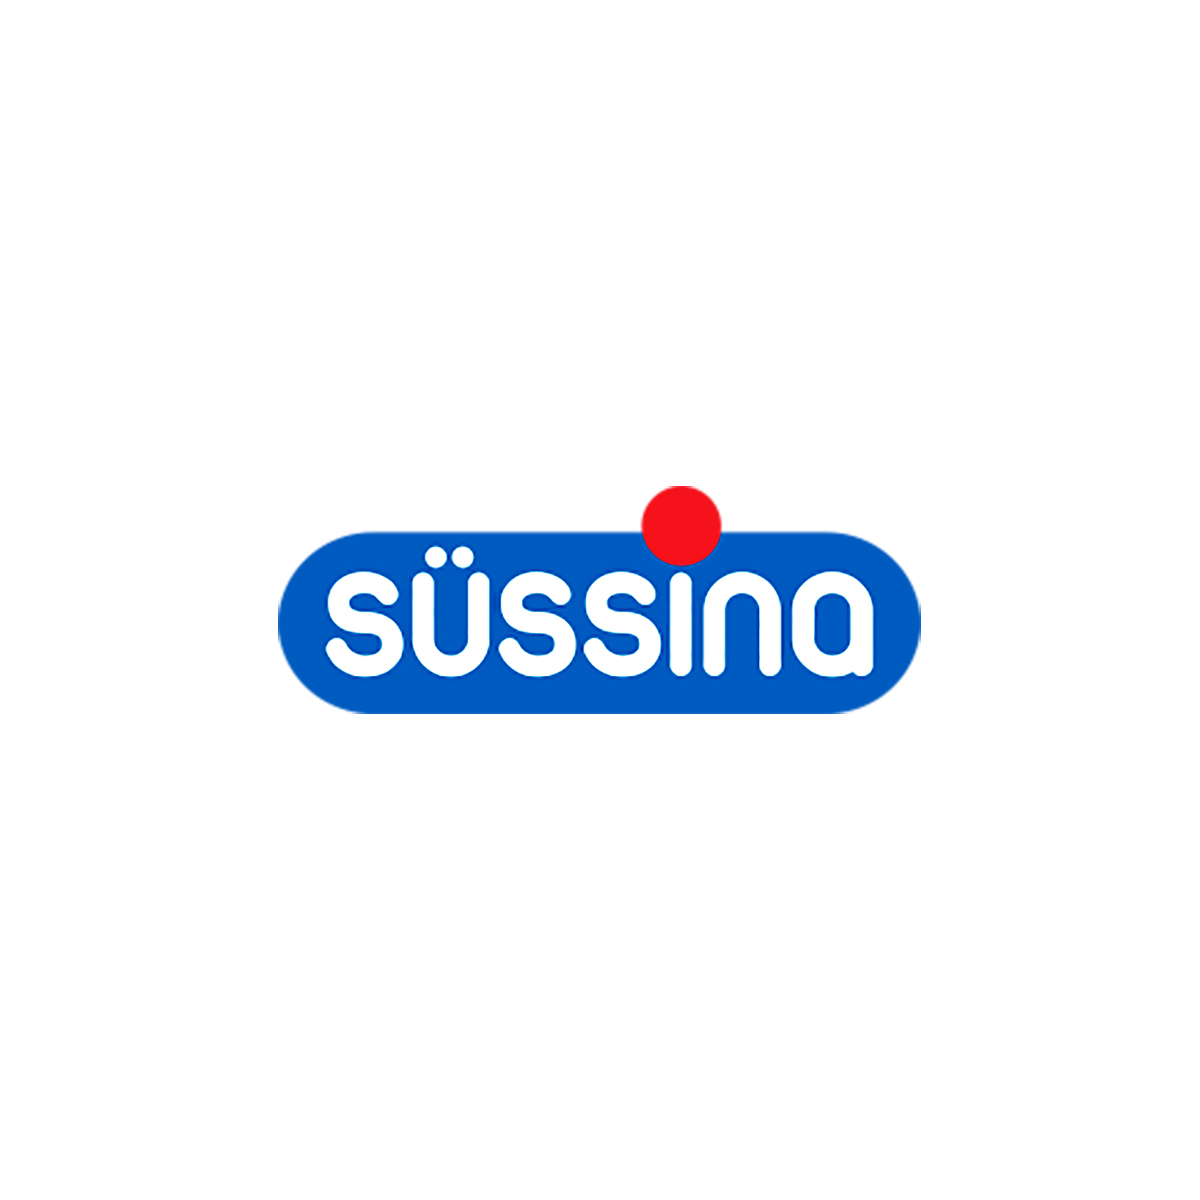 Sussina